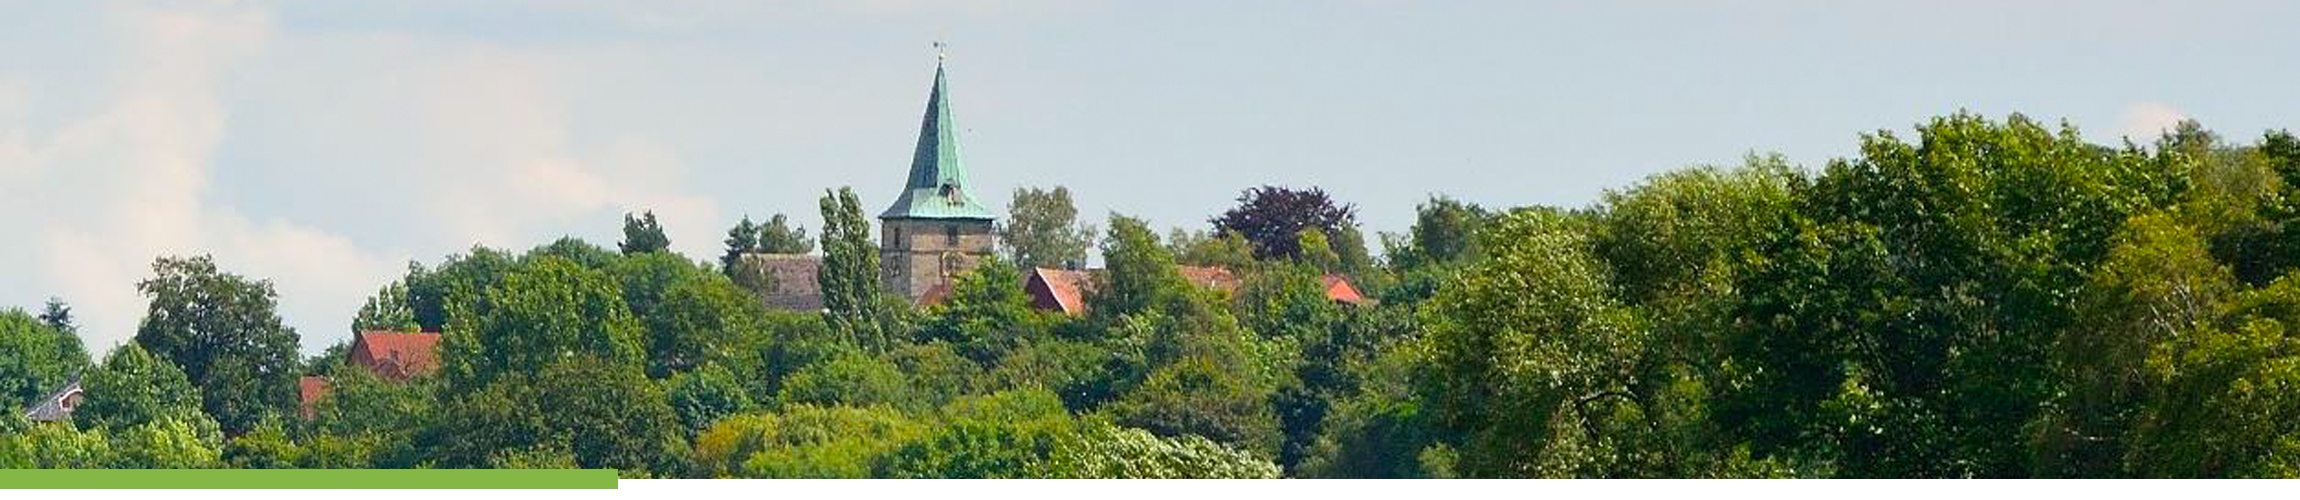 Schaumburg-Lippe-Hospizberatung-hilfe_beim_tod-todesbewältigung